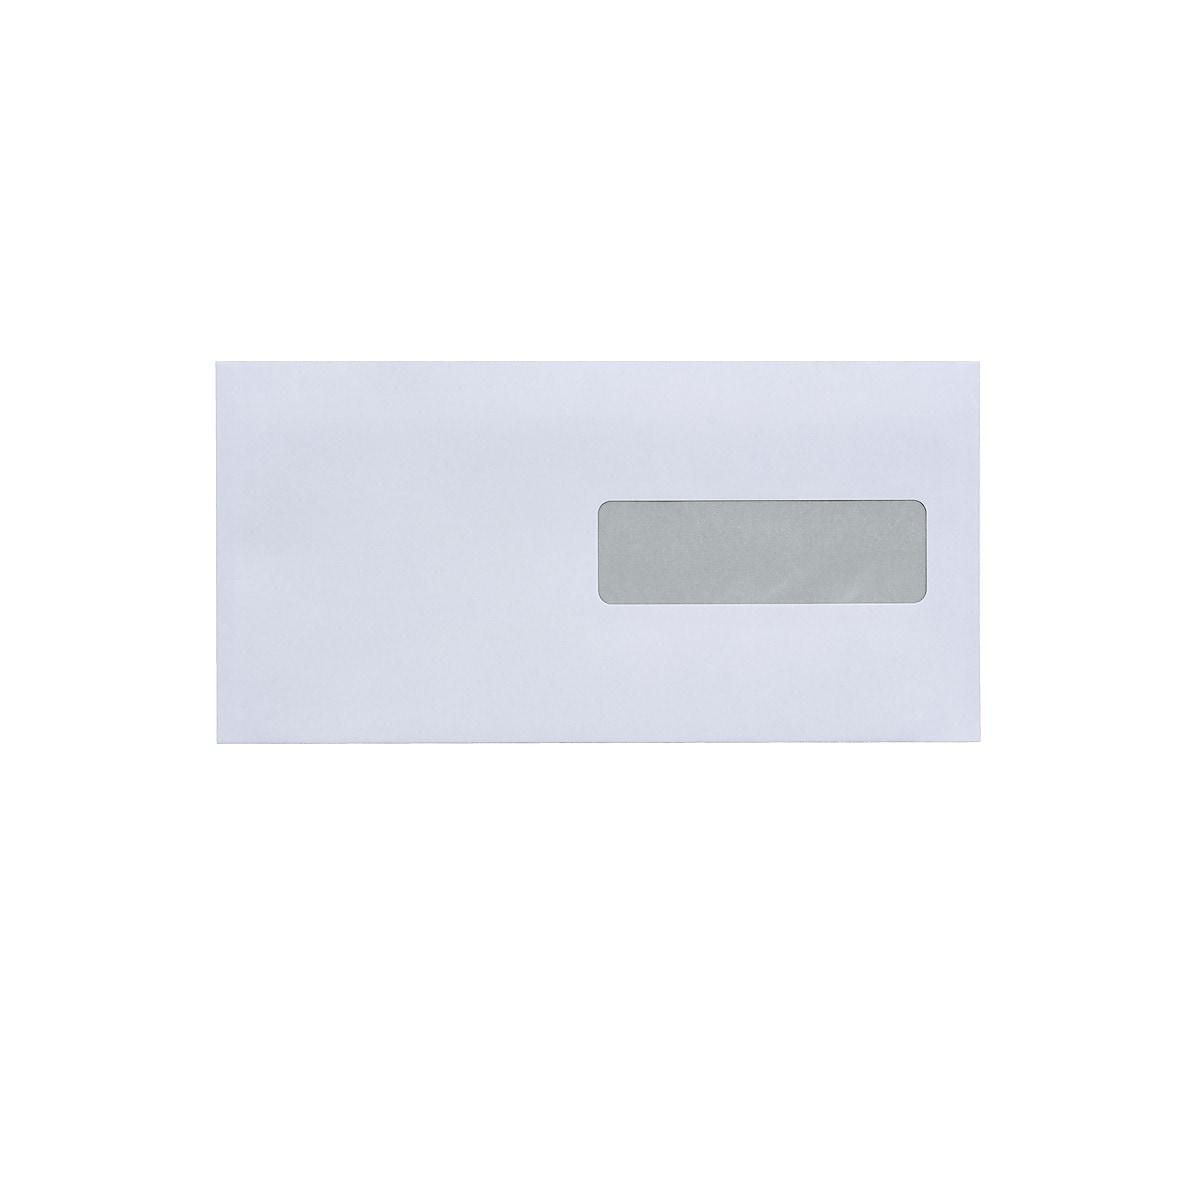 Fönsterkuvert E65 H2, vita, 50-pack